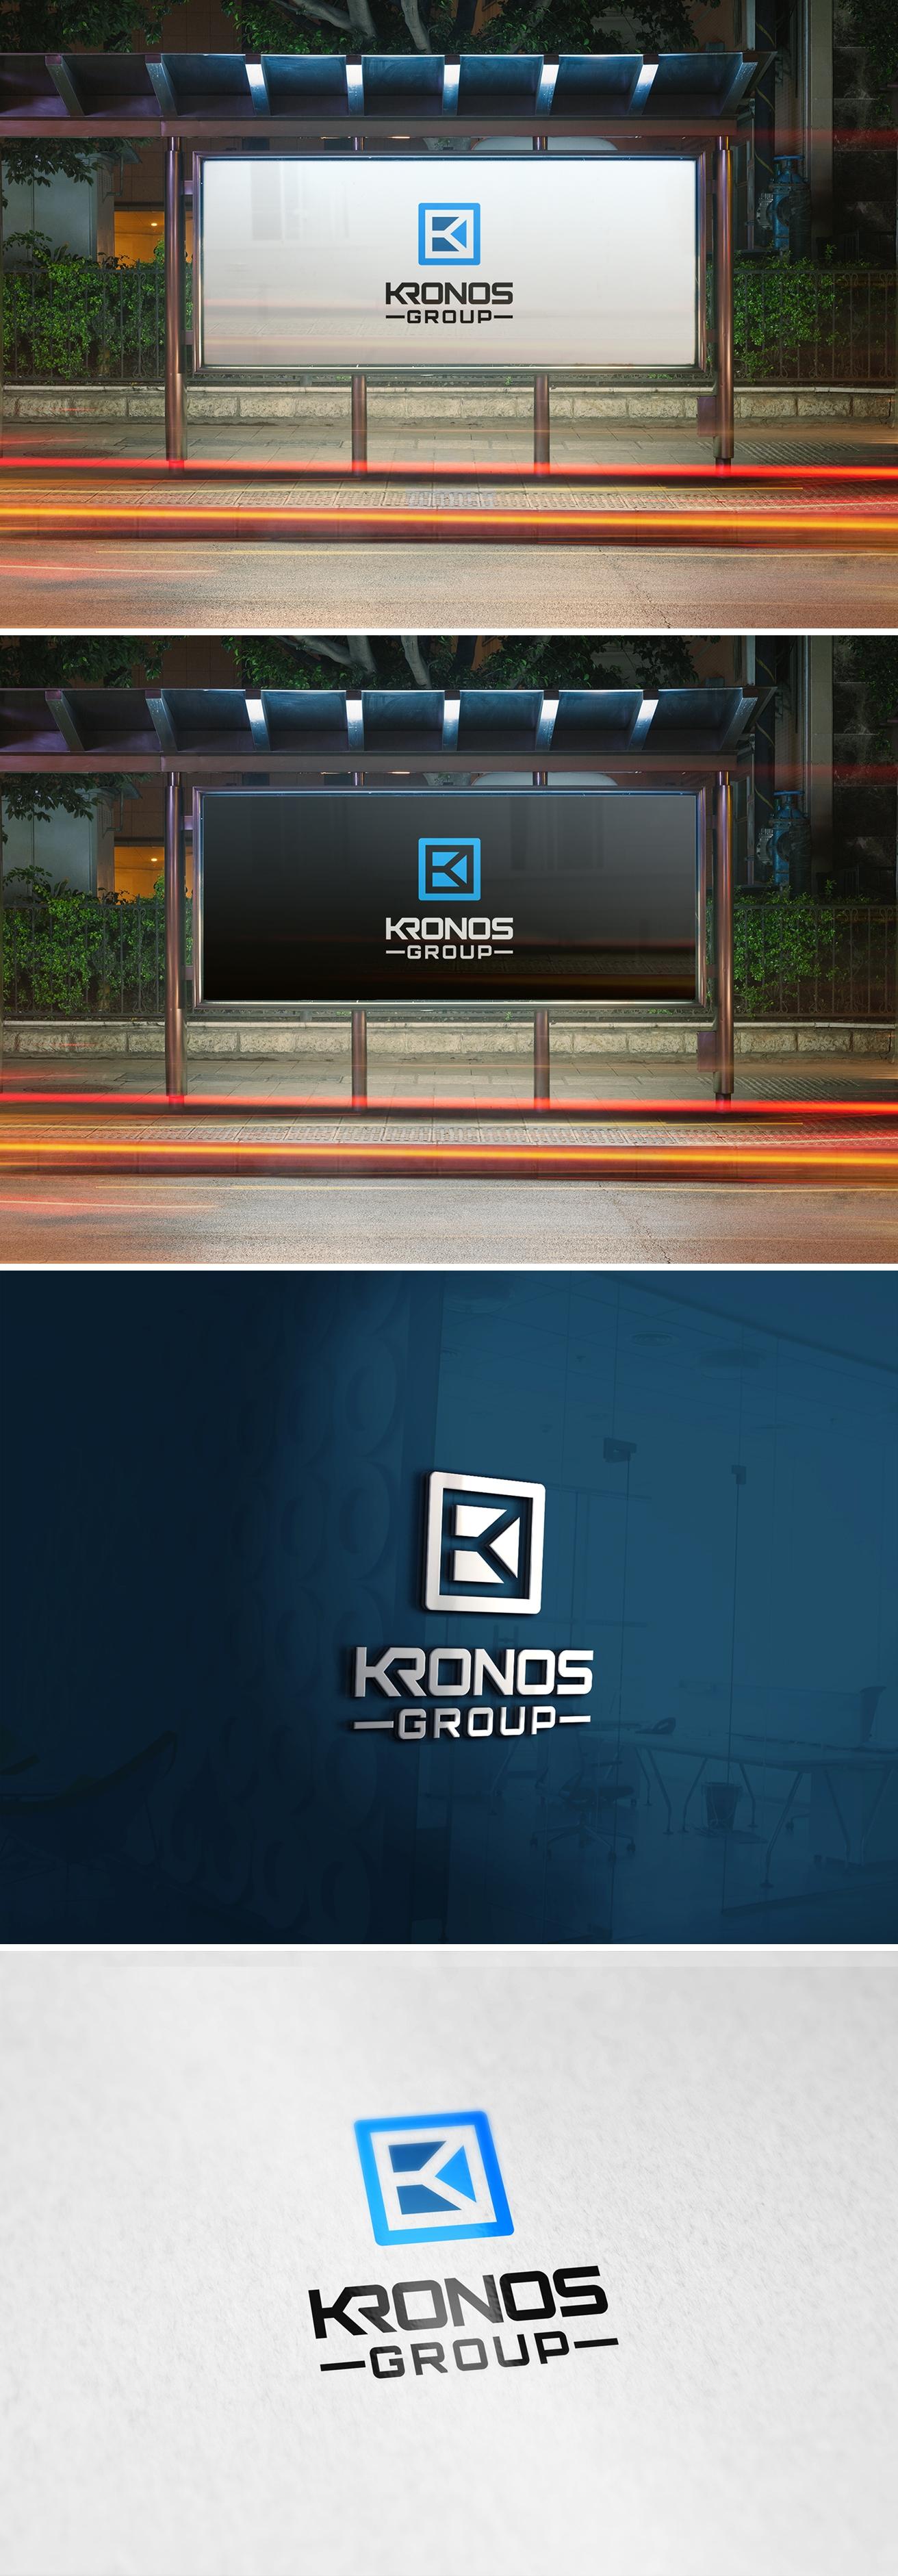 Разработать логотип KRONOS фото f_8005fafe0f0a3f25.jpg